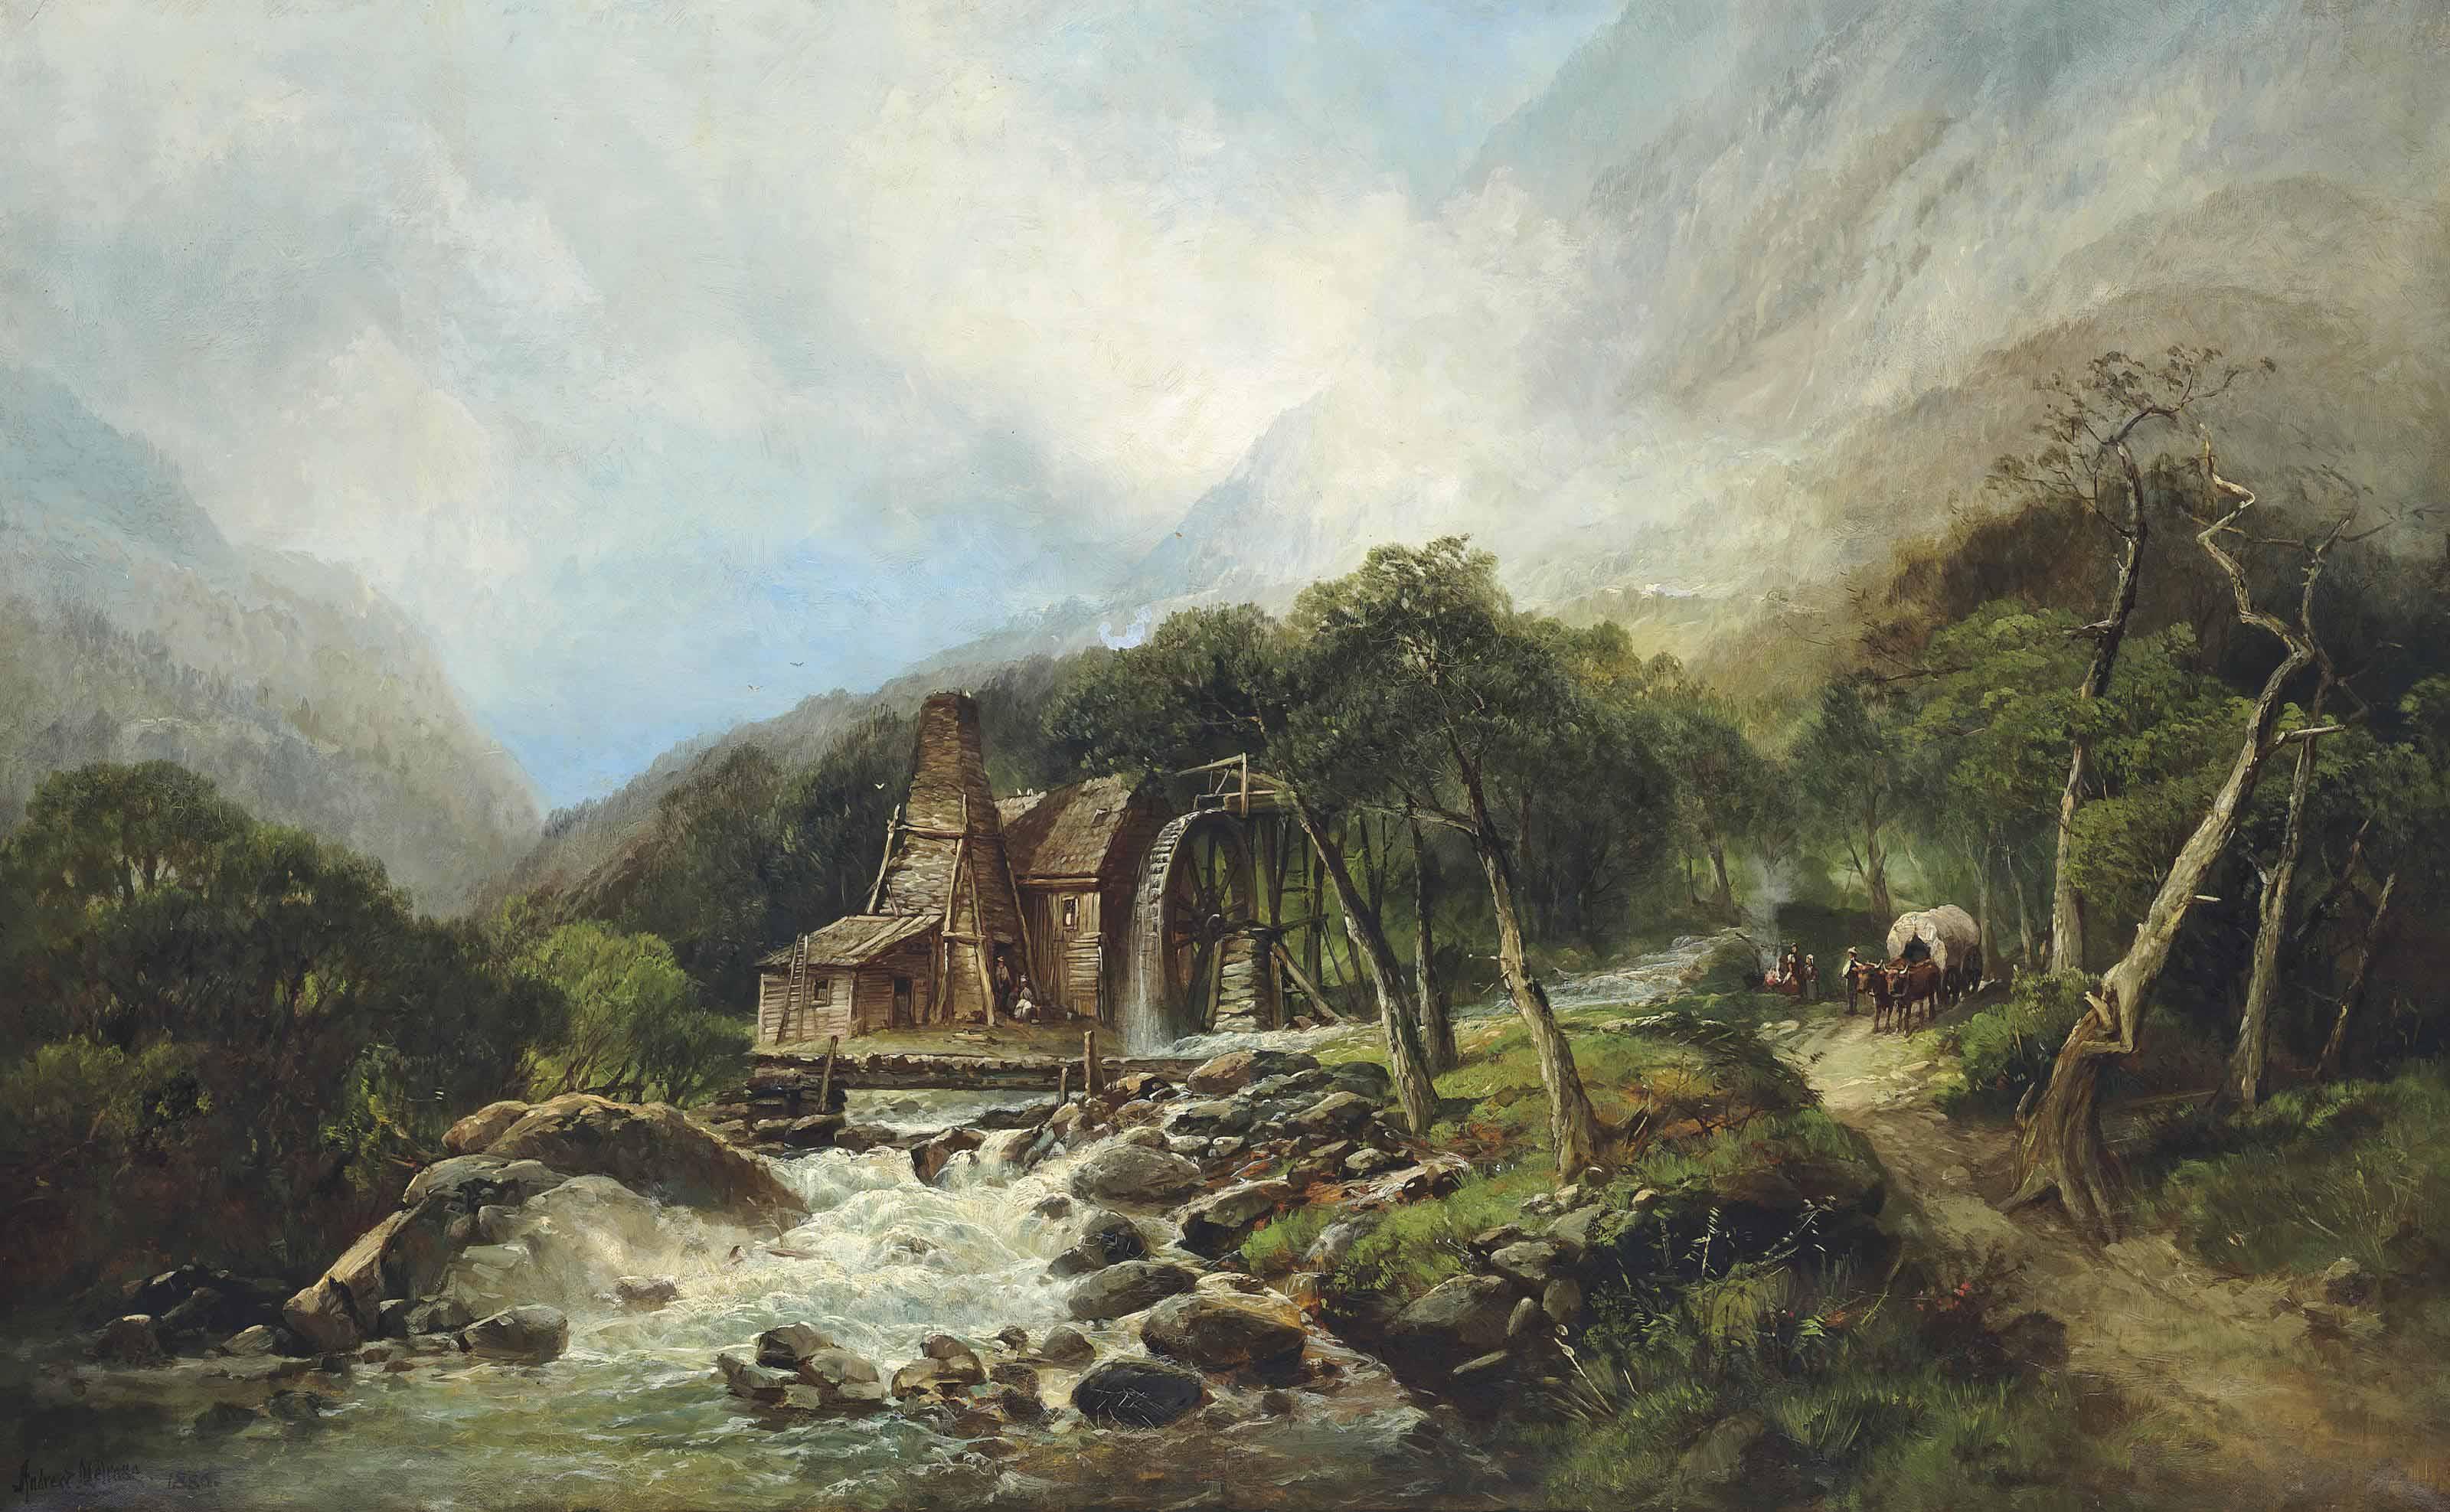 Andrew W. Melrose (American, 1836-1901)